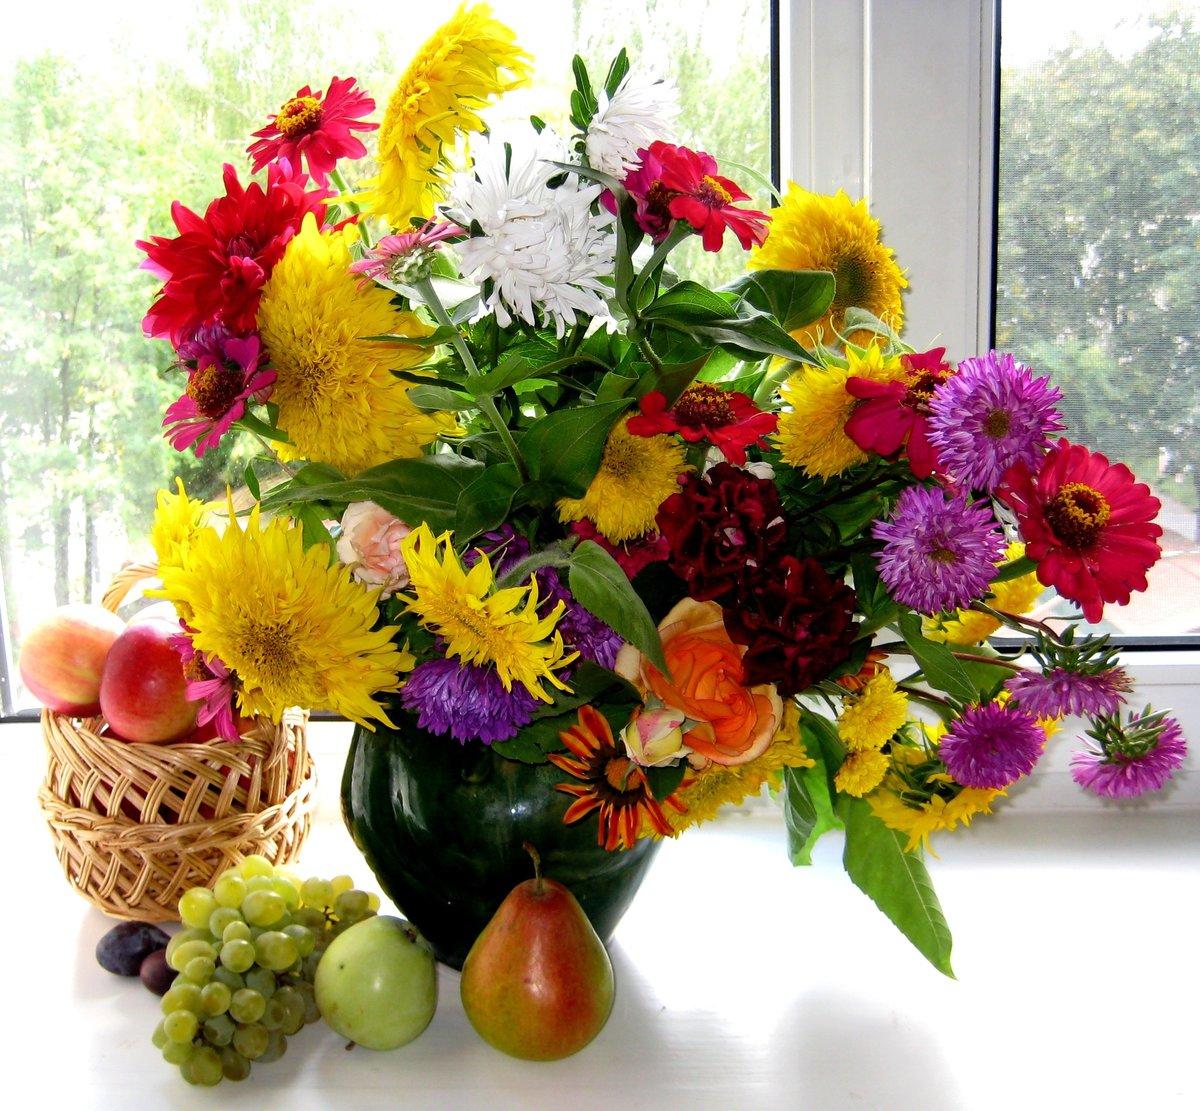 Картинки с букетами летних цветов, днем сотрудника